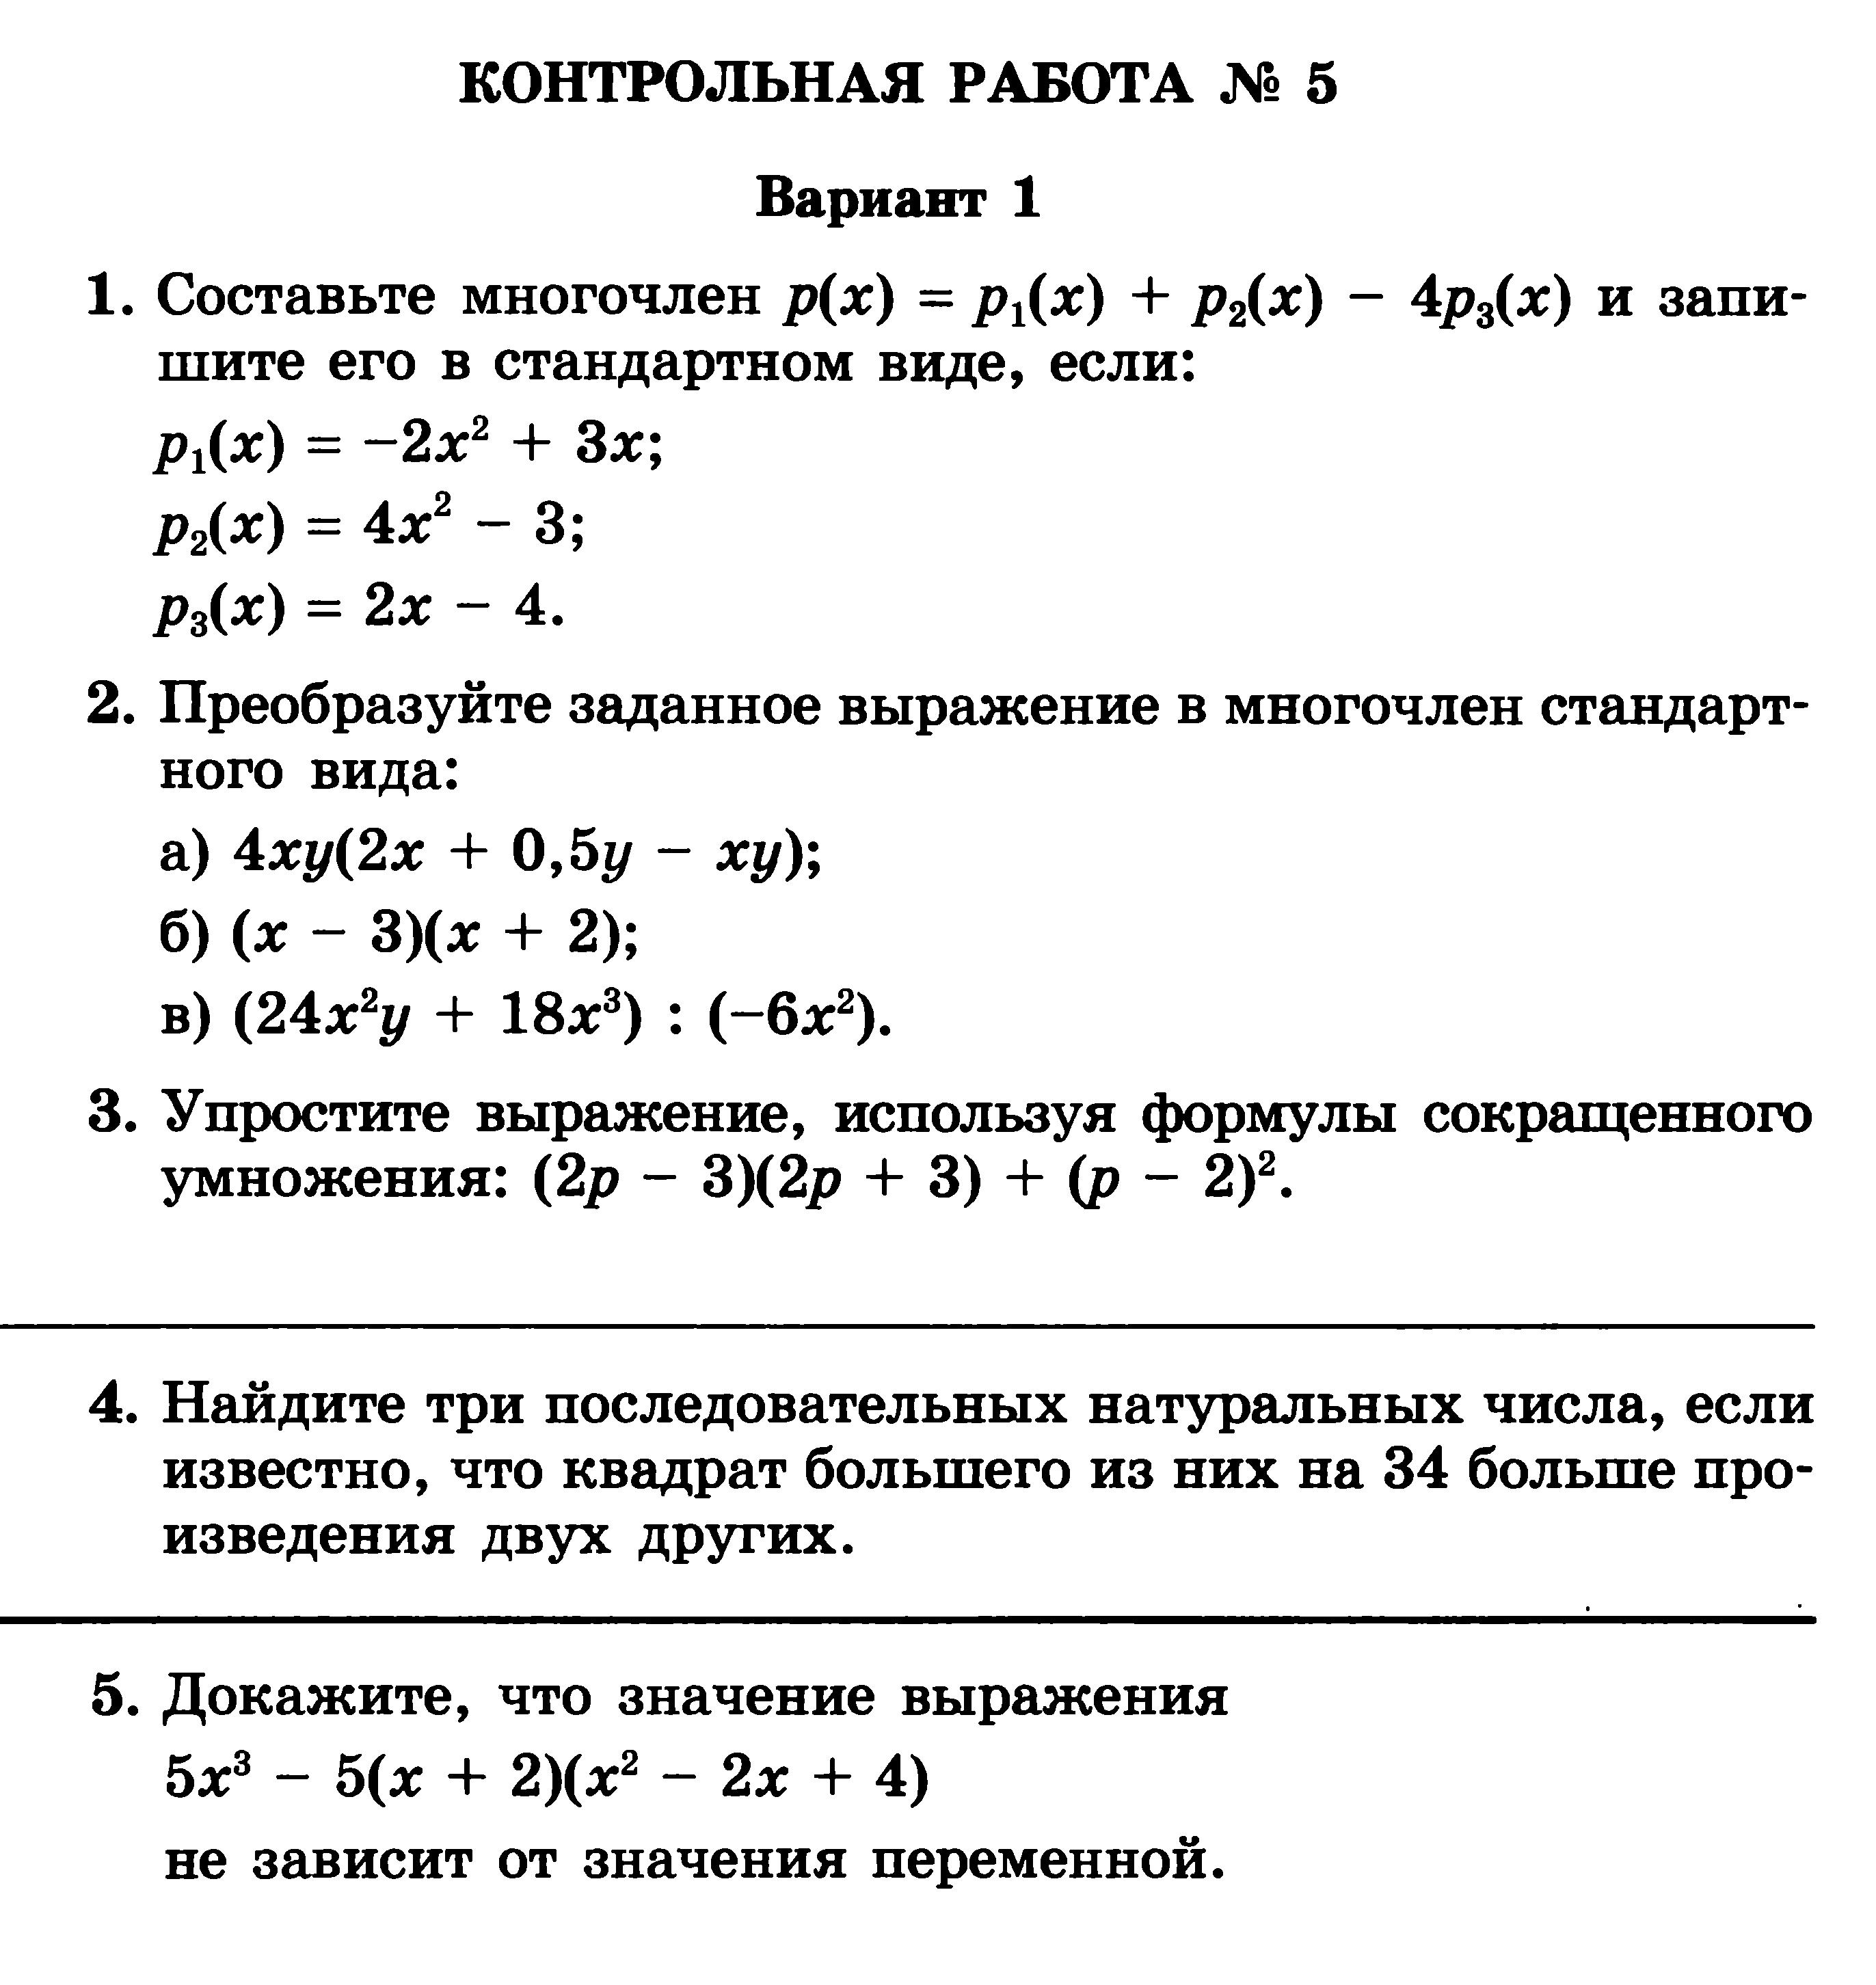 Рабочая программа по алгебре класс hello html 6ee82599 png